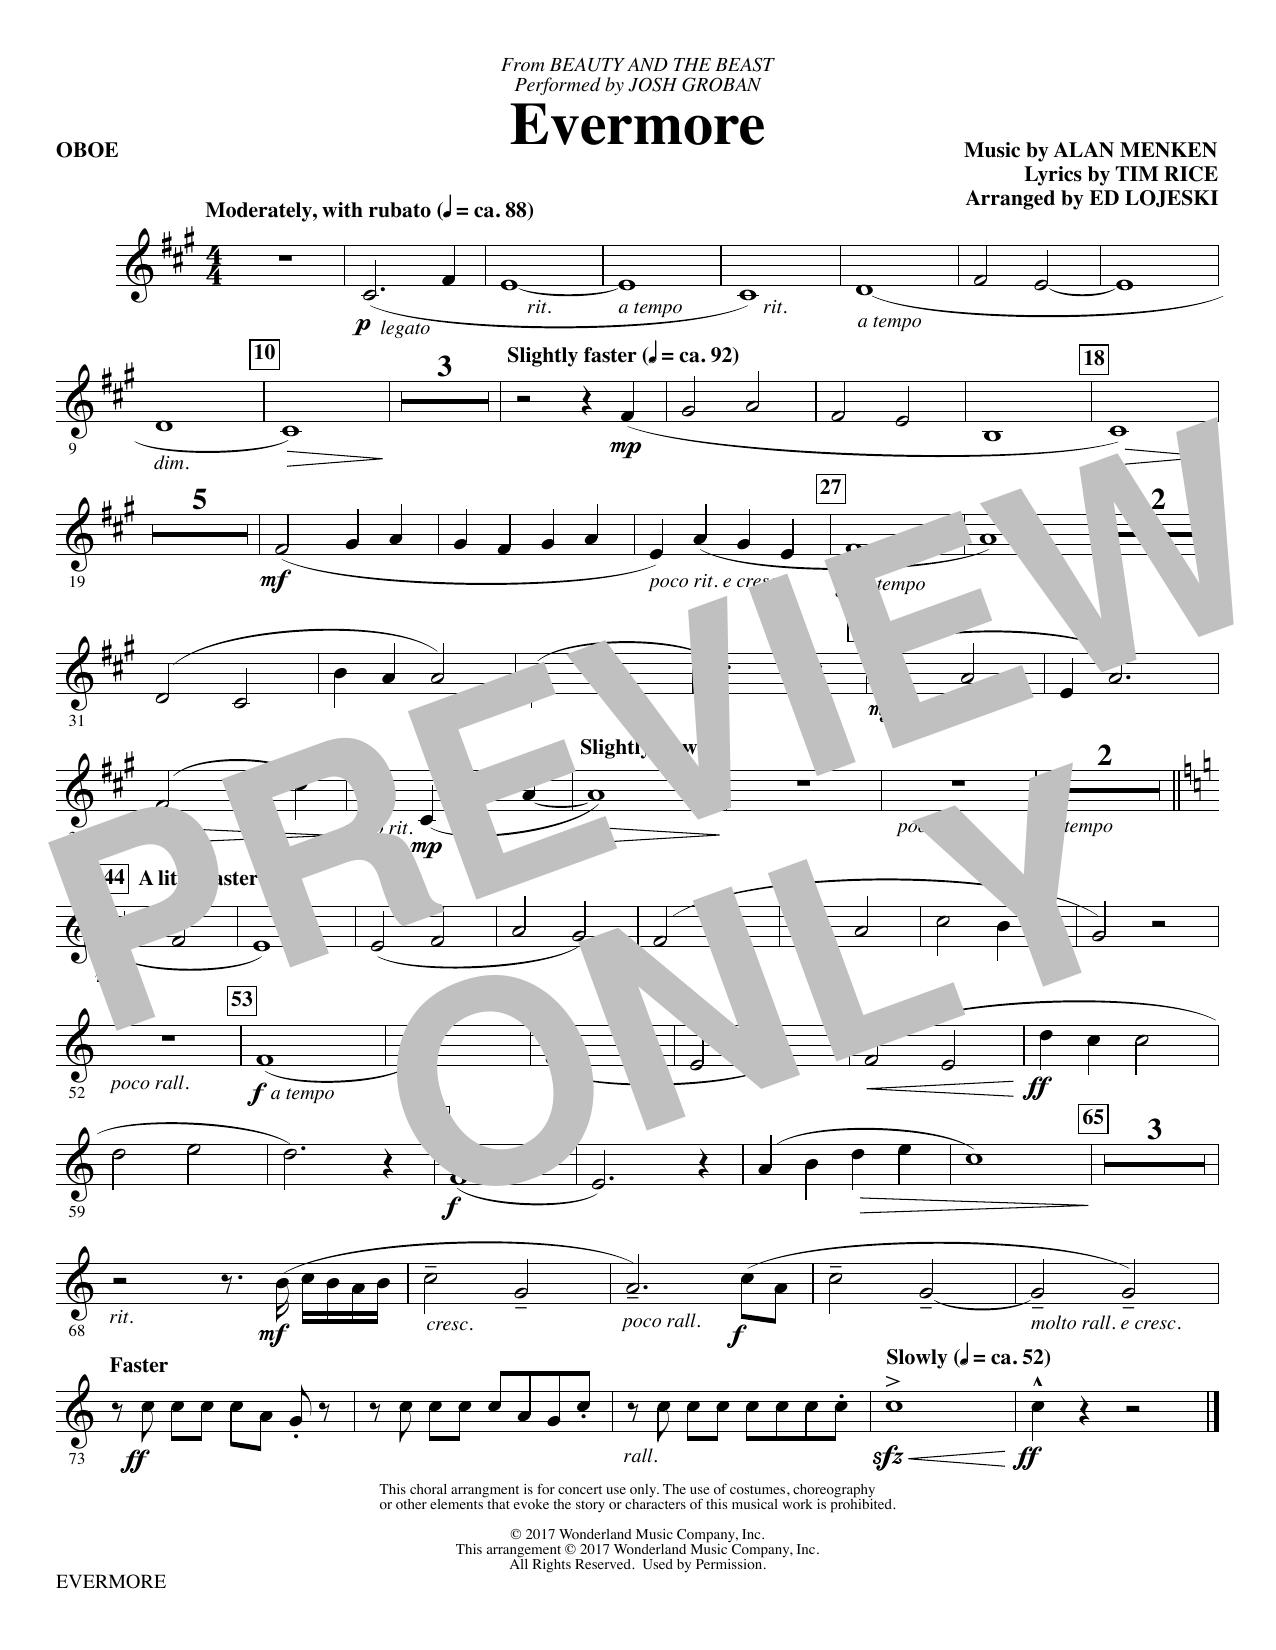 Josh Groban - Evermore - Oboe